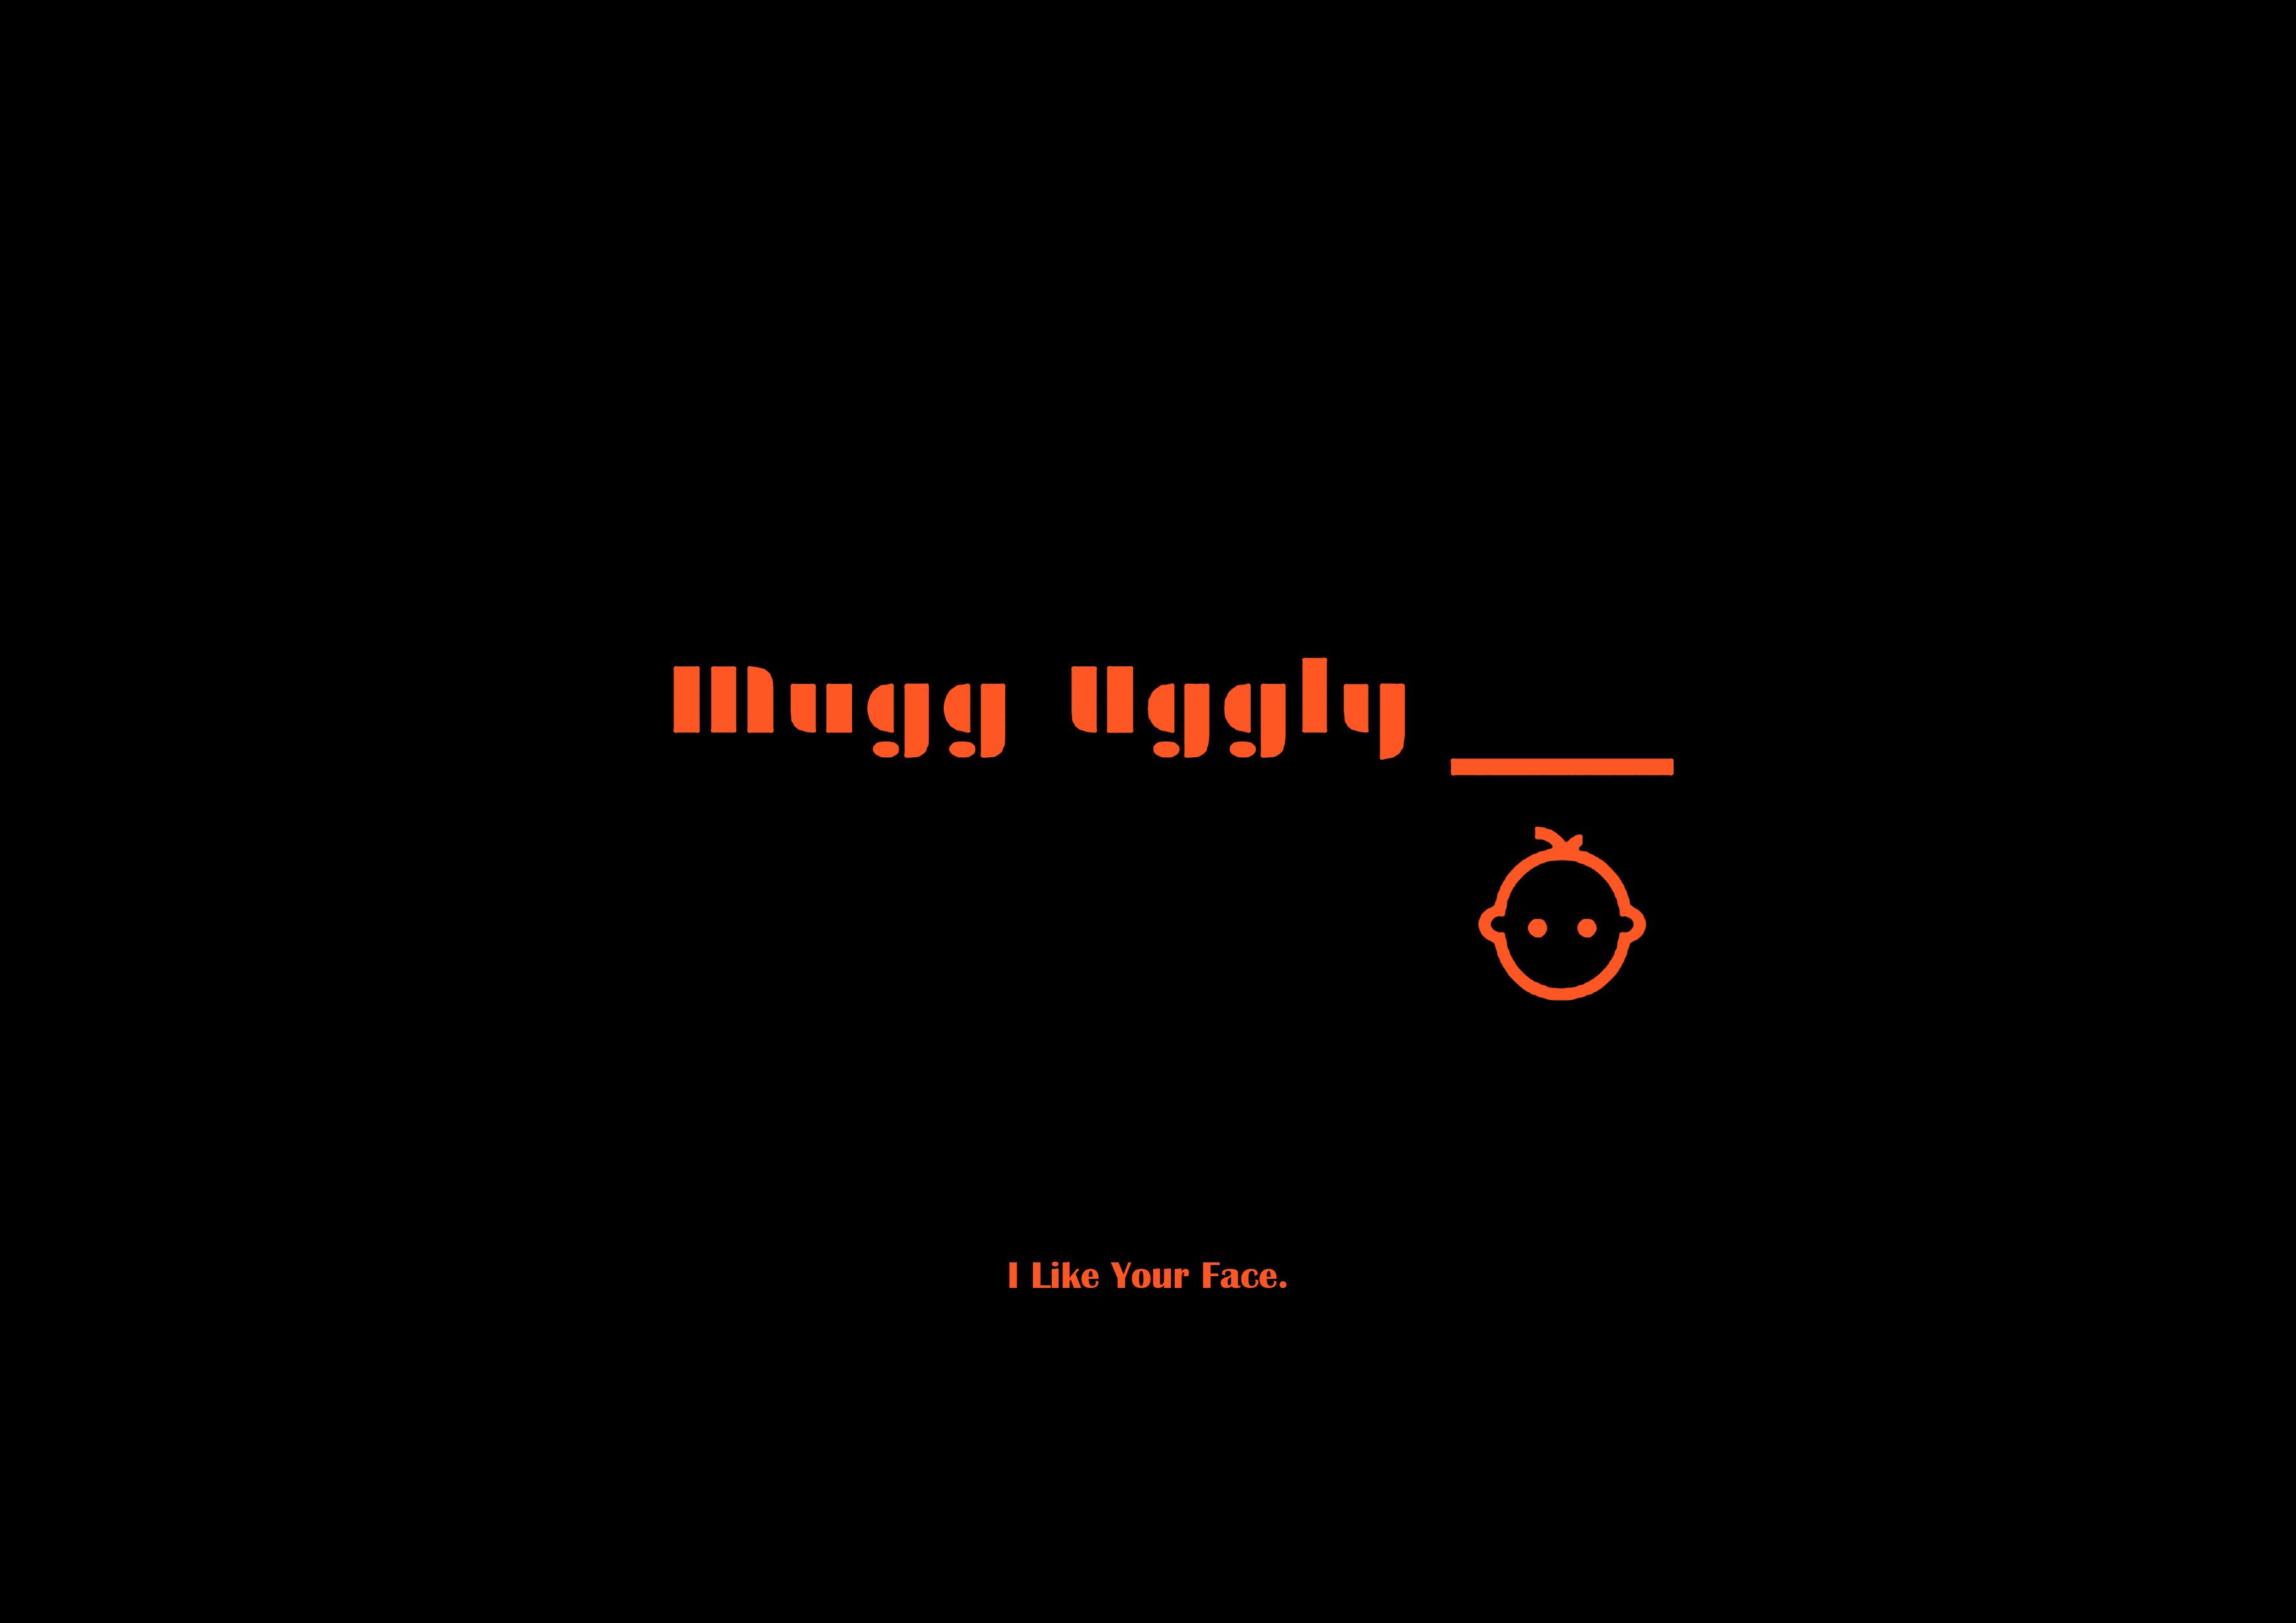 Mugg Uggly